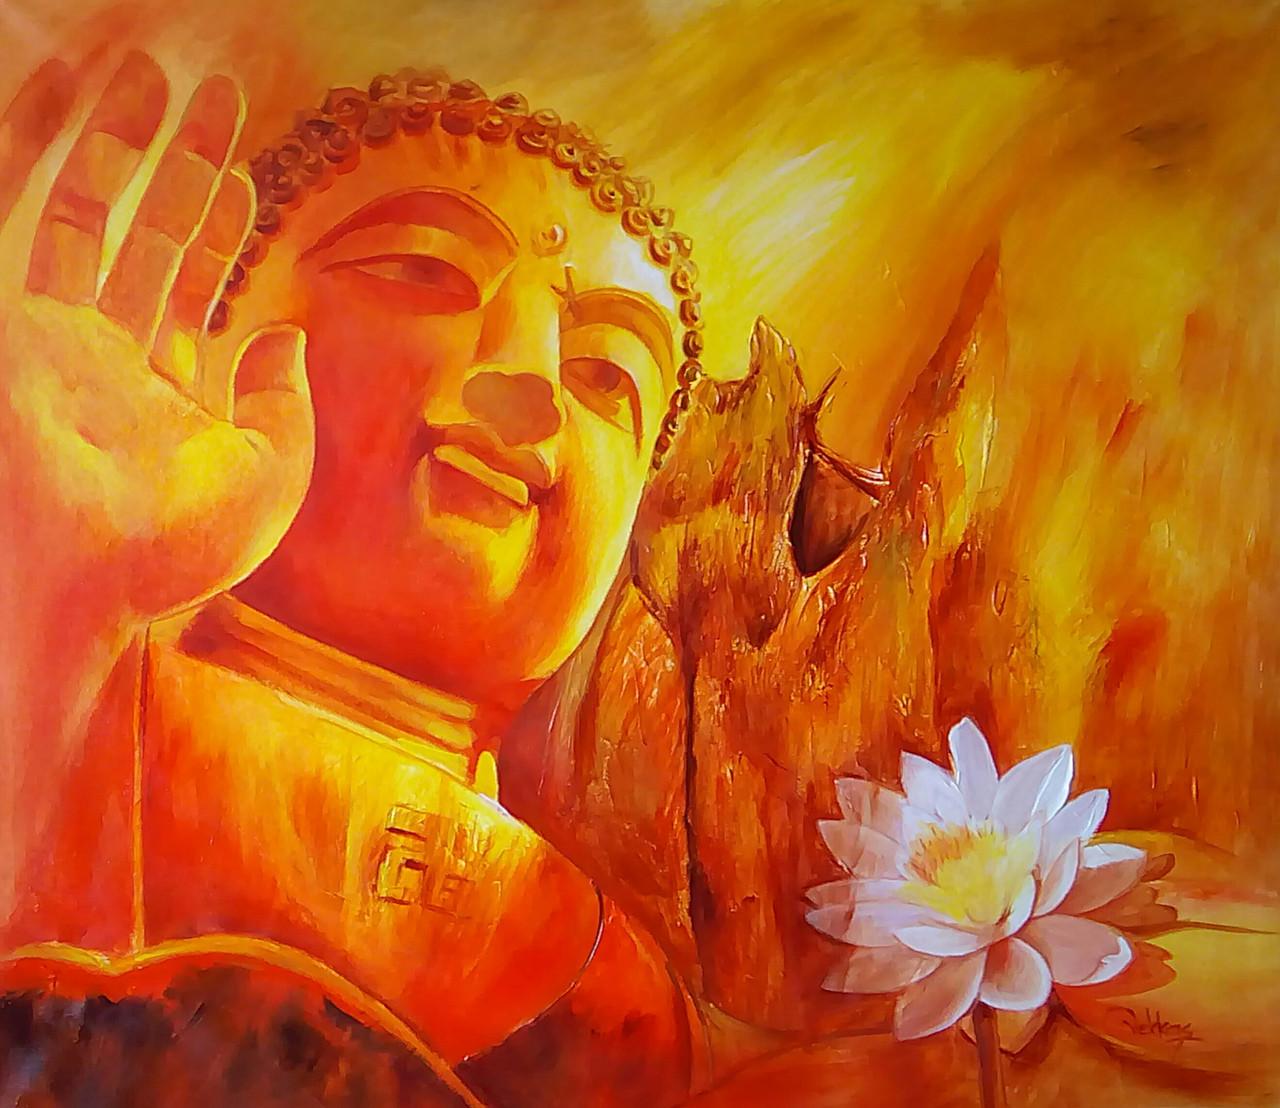 bon aqua buddhist singles Sirius isness - aqua buddha flepa loading unsubscribe from flepa cancel unsubscribe working subscribe.